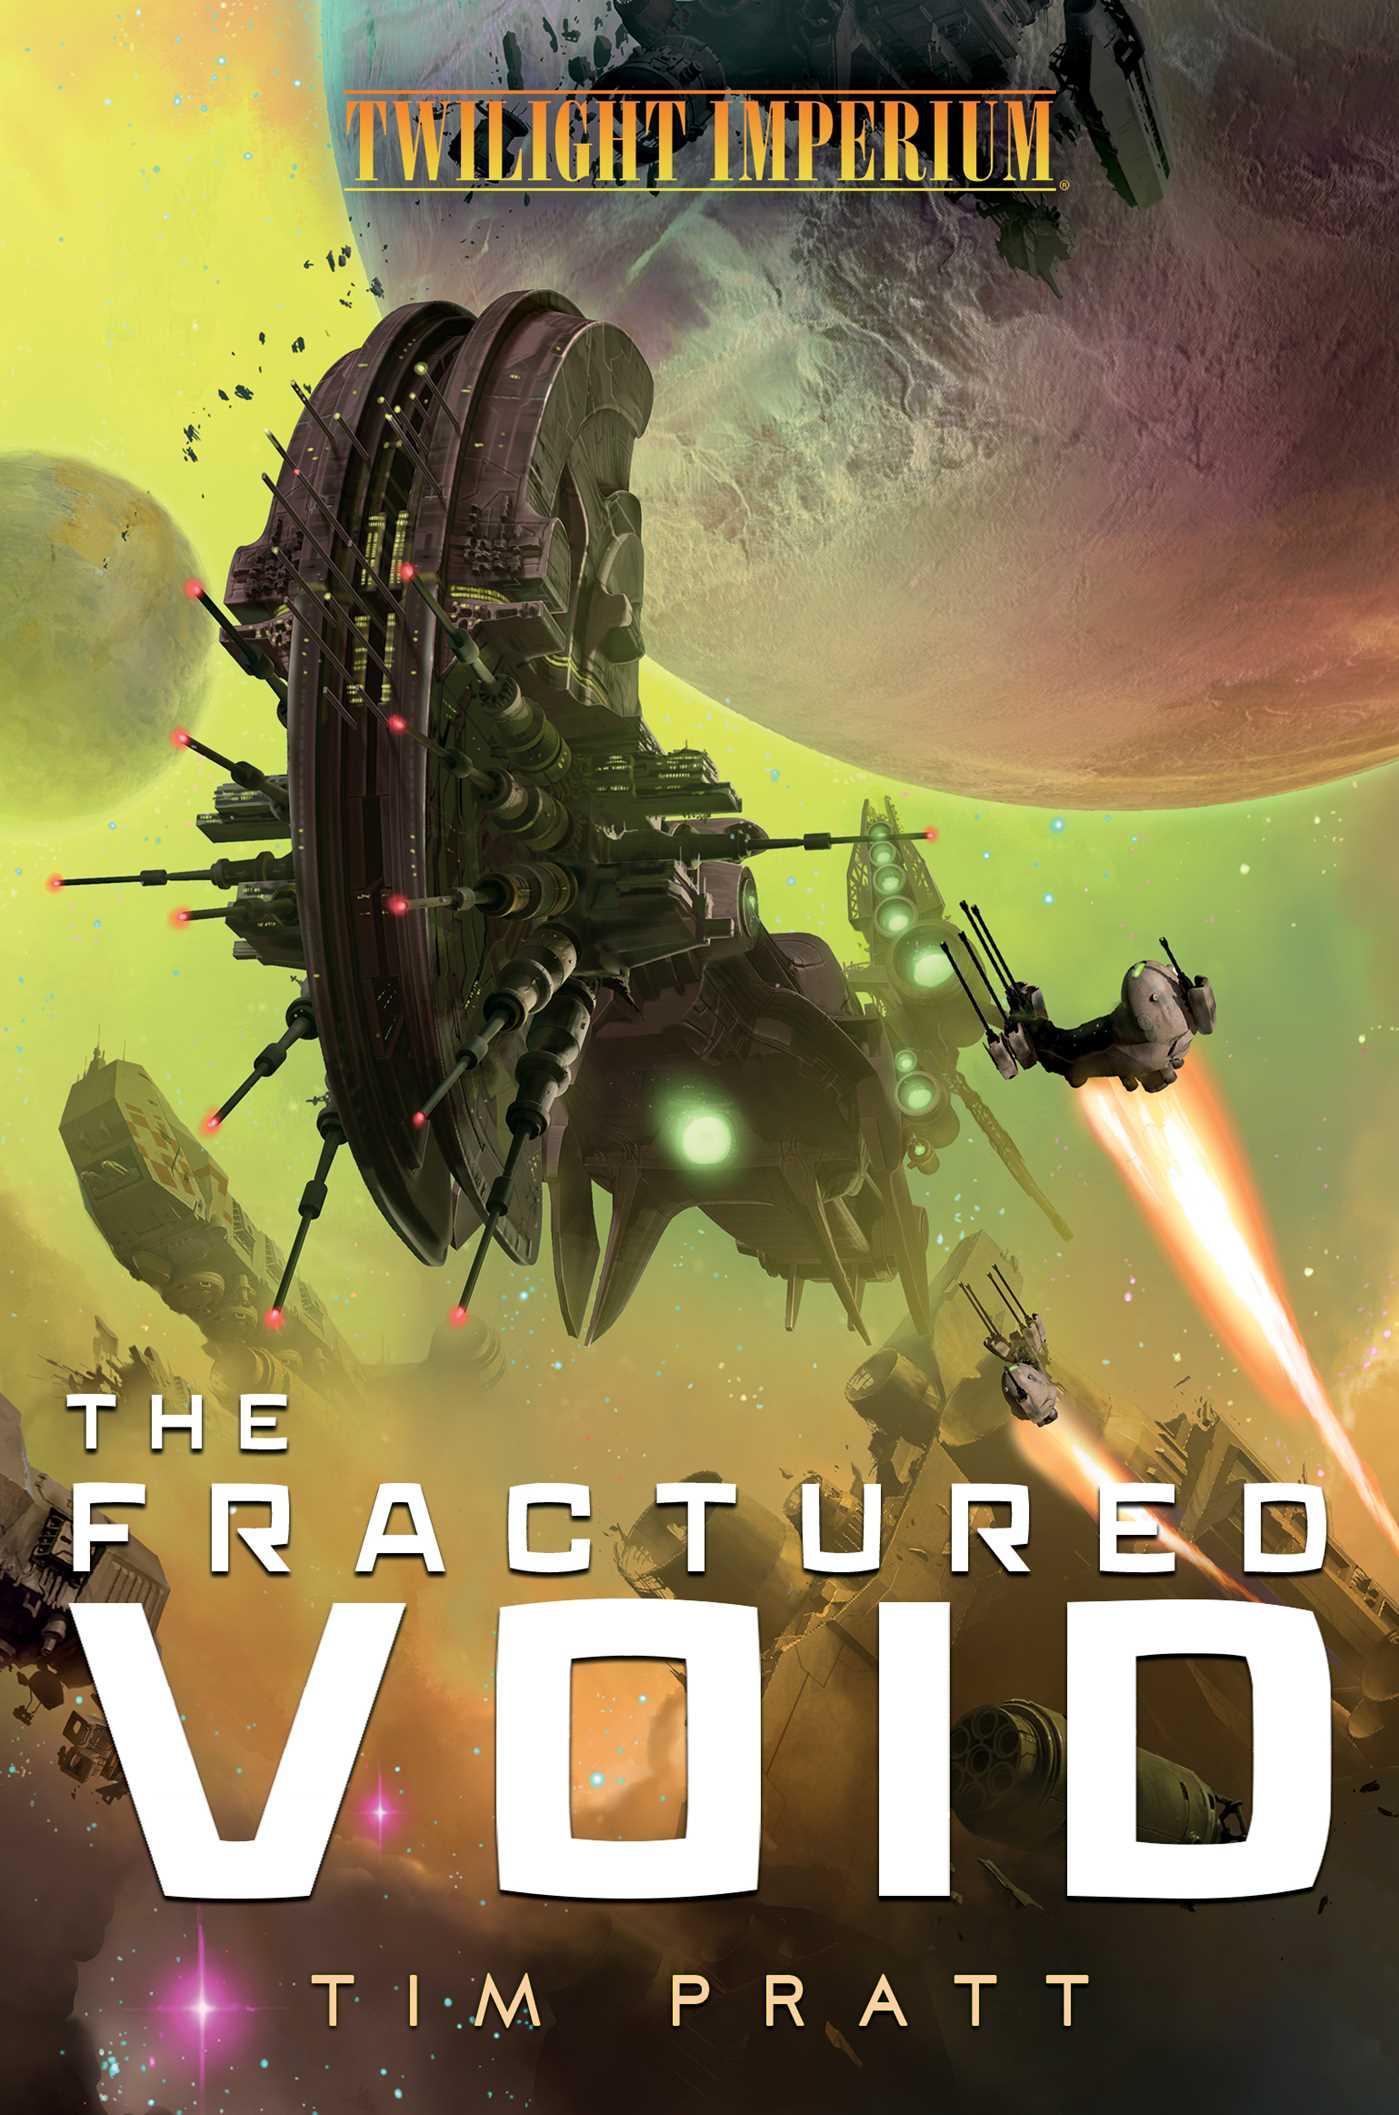 retro futuristic book cover example as a 2021 trend